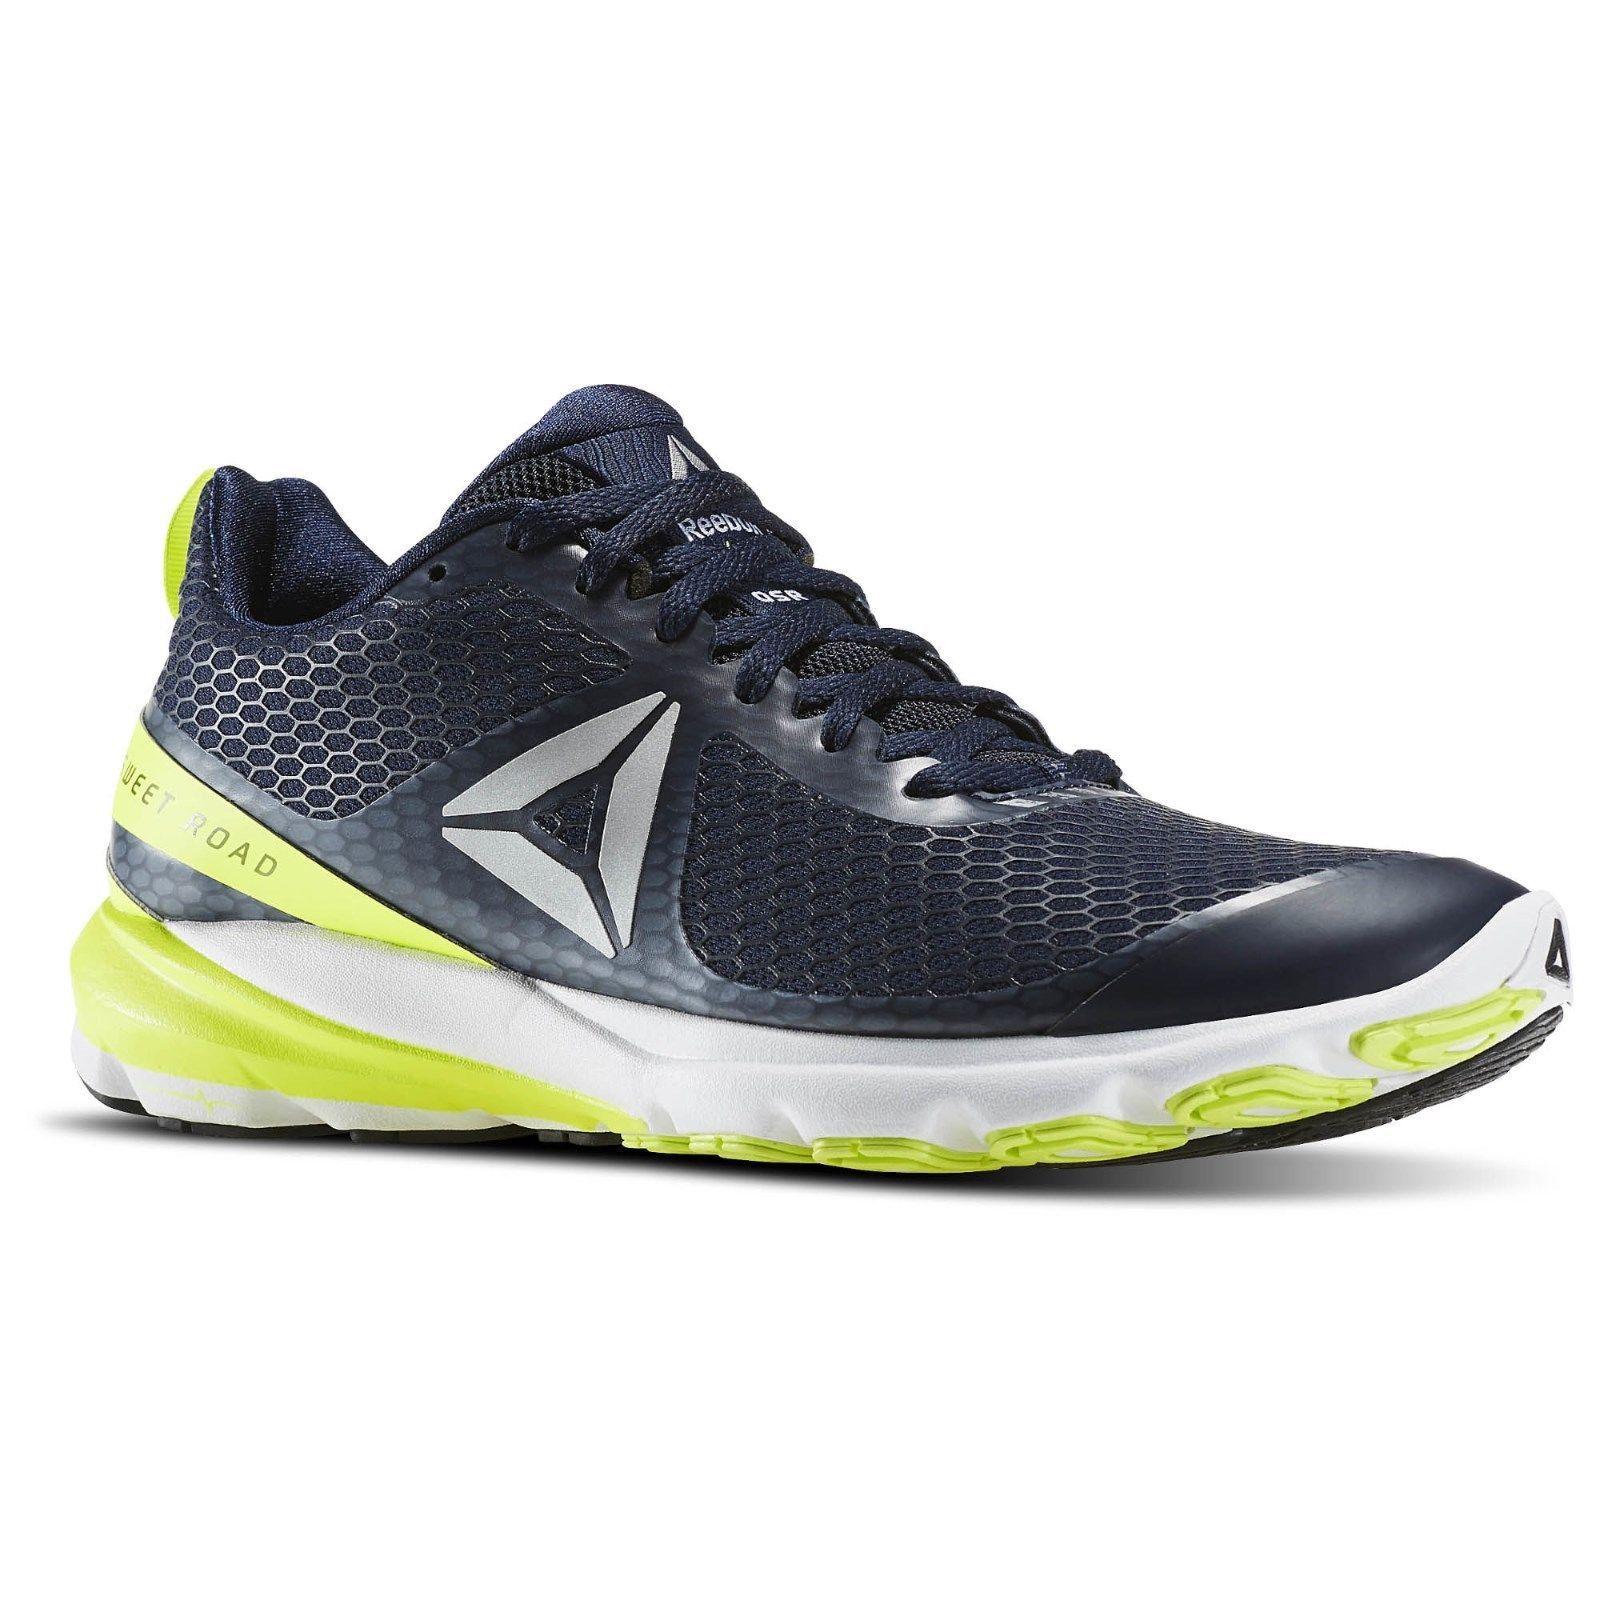 Reebok Men s OSR Sweet Road Running Shoes and 50 similar items 8fab058b4